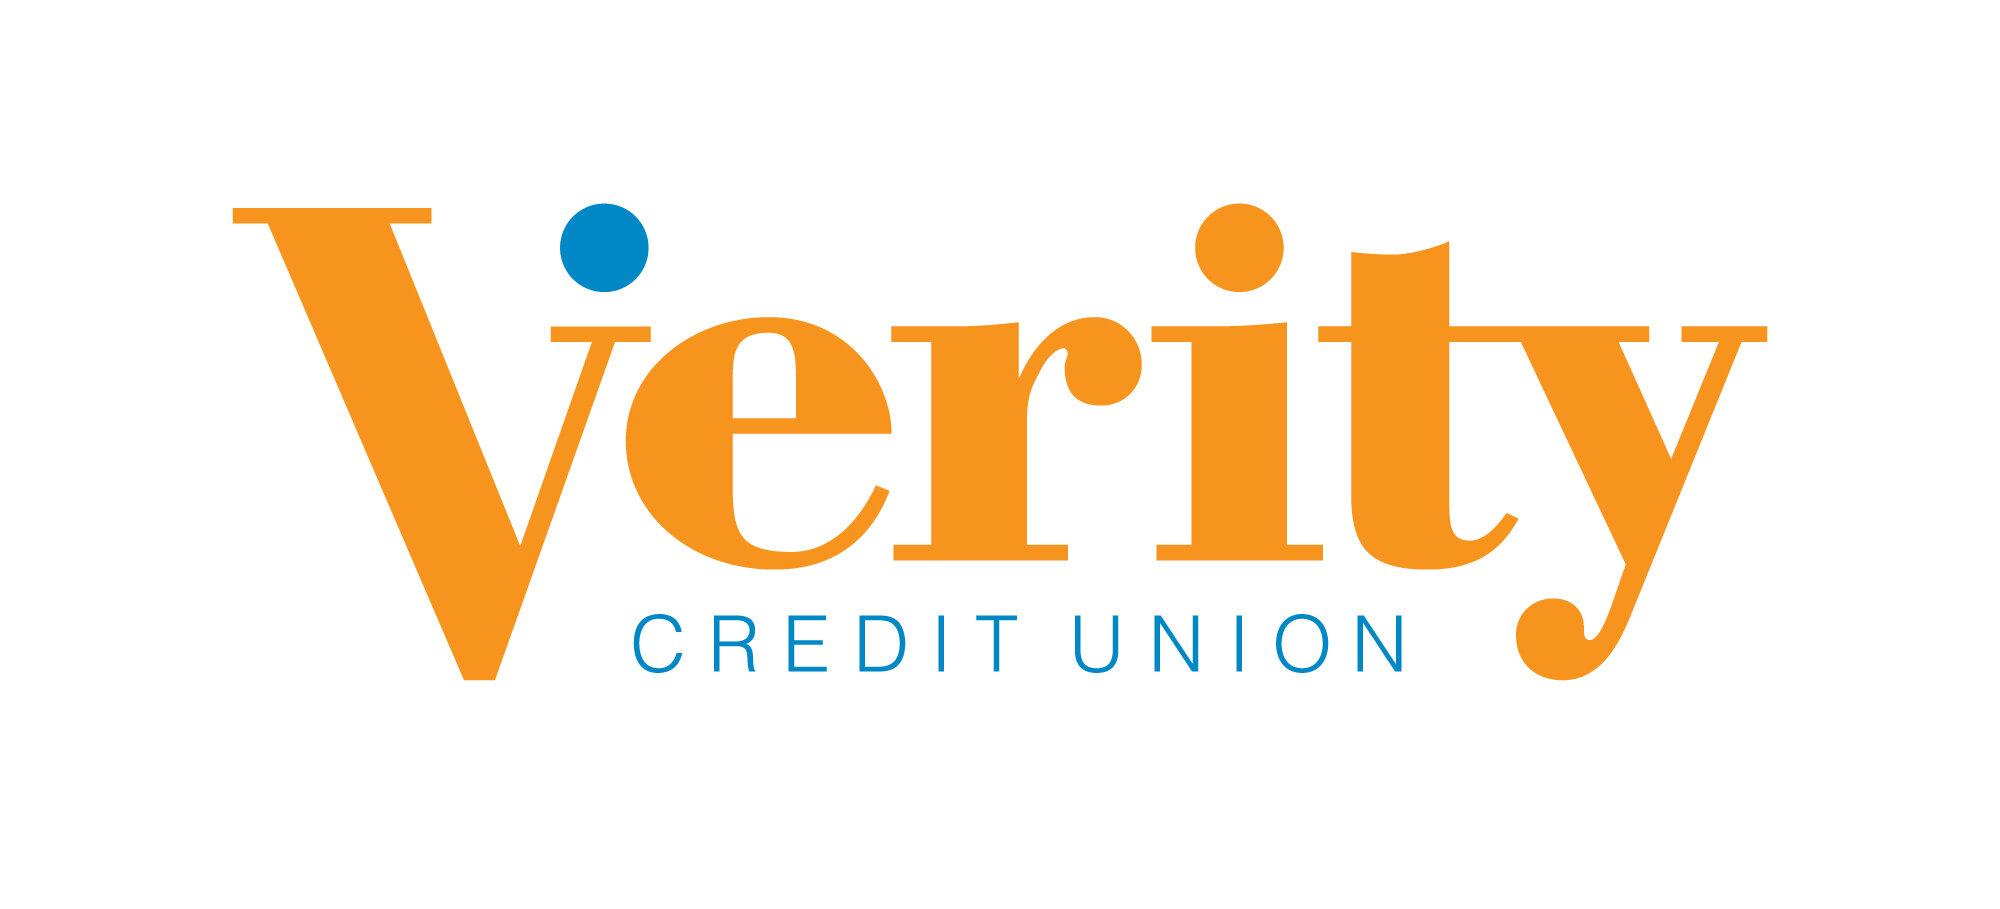 Image description: Verity Credit Union logo